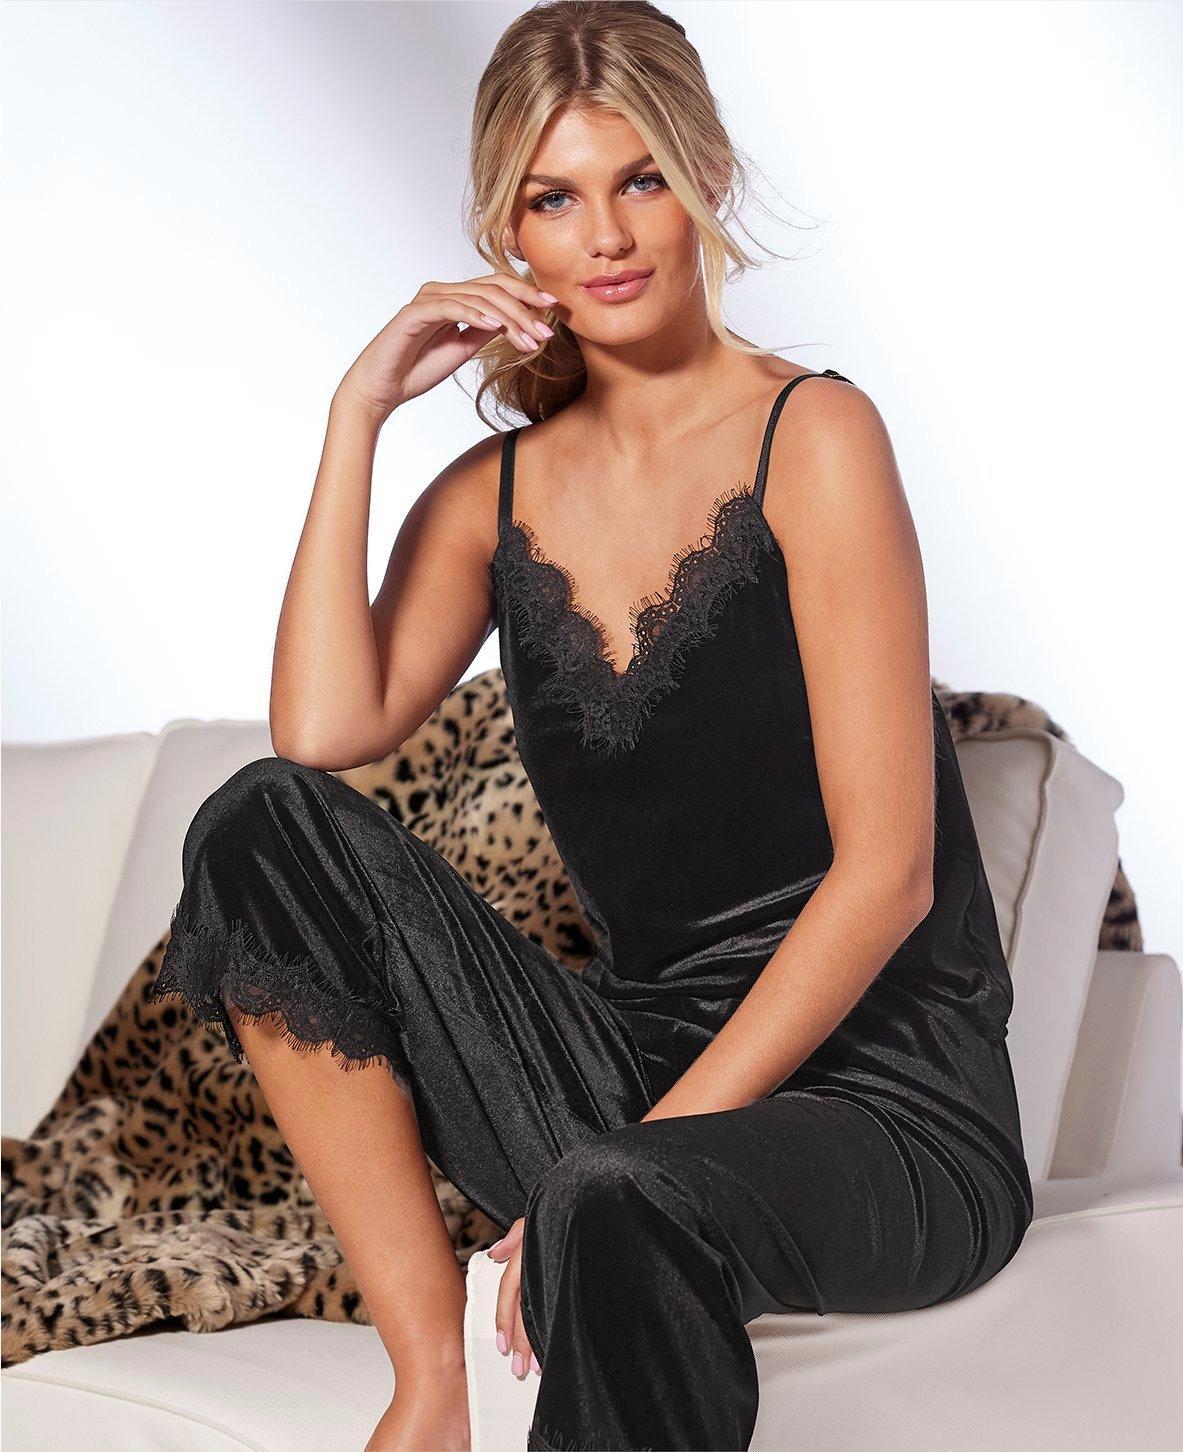 model wearing a black lace sleep set.